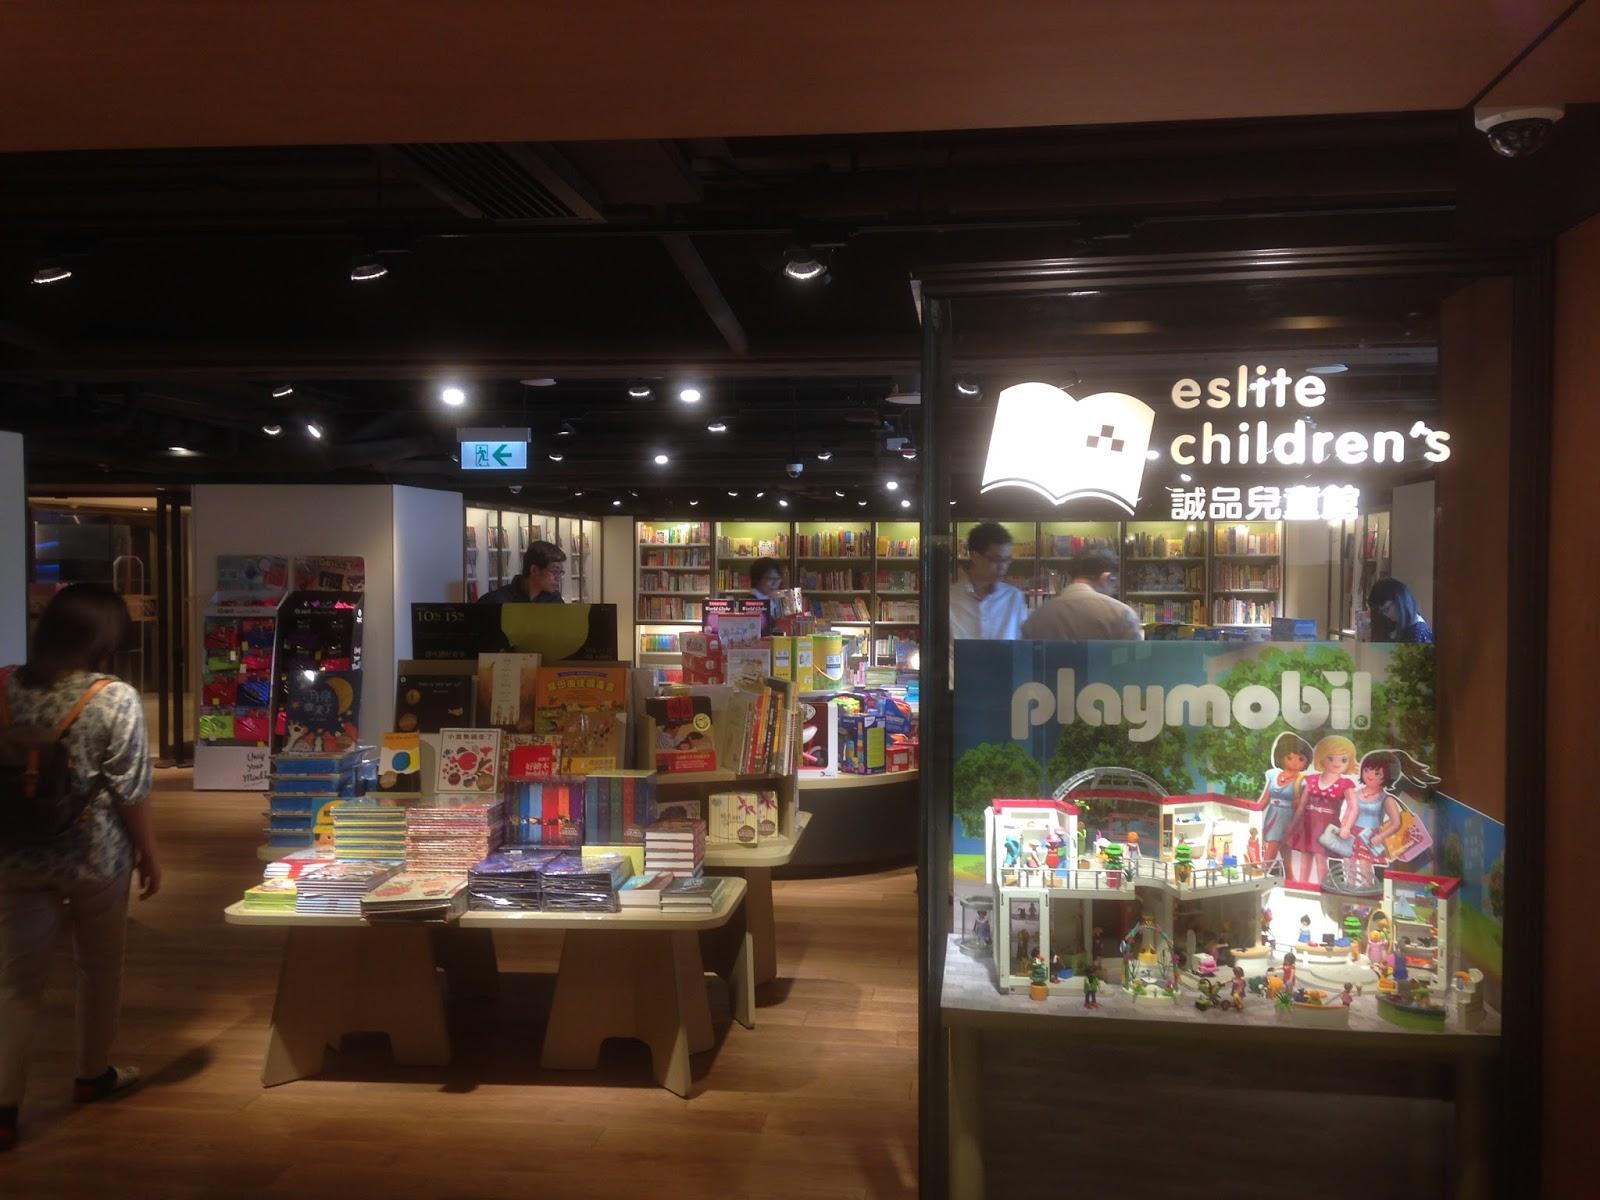 Catabookism: Children's Book Reviews: 看書還是買玩具?記尖沙咀誠品兒童館